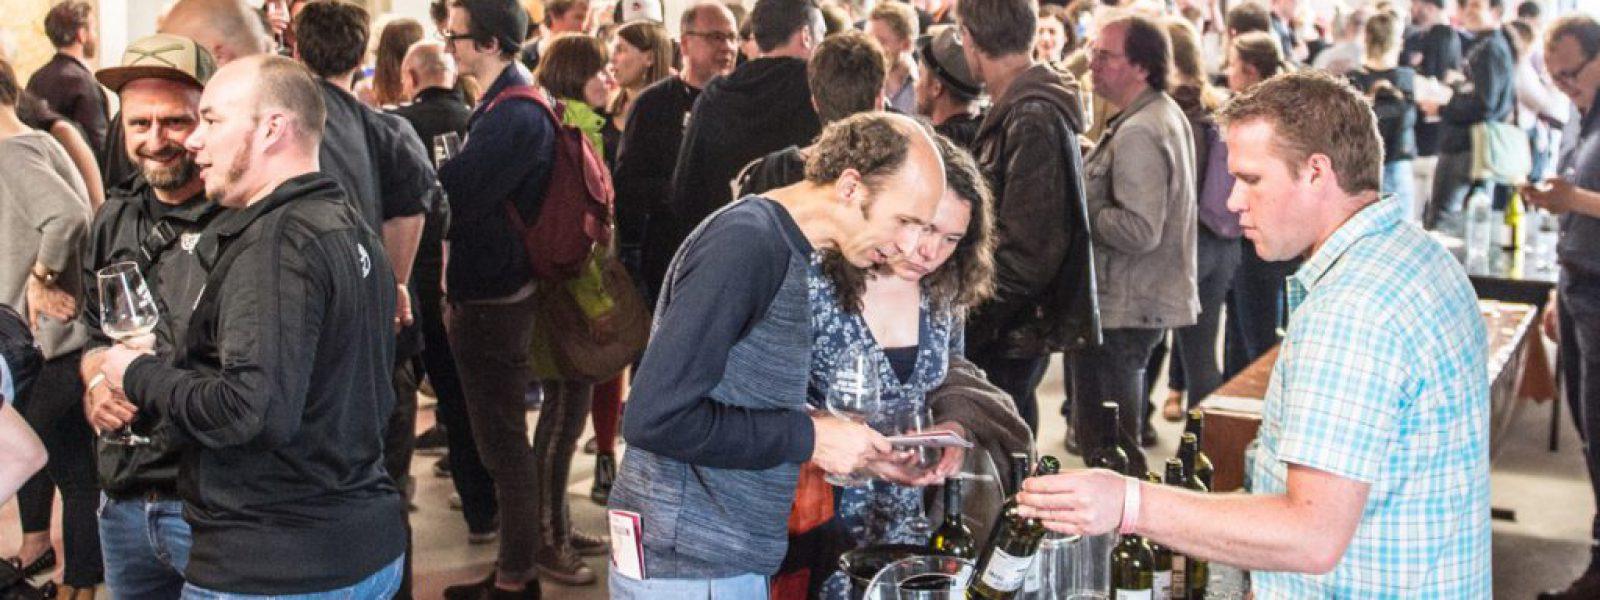 Weinfest gegen Rassismus (Fotos Sabrina Adeline Nagel) - 28